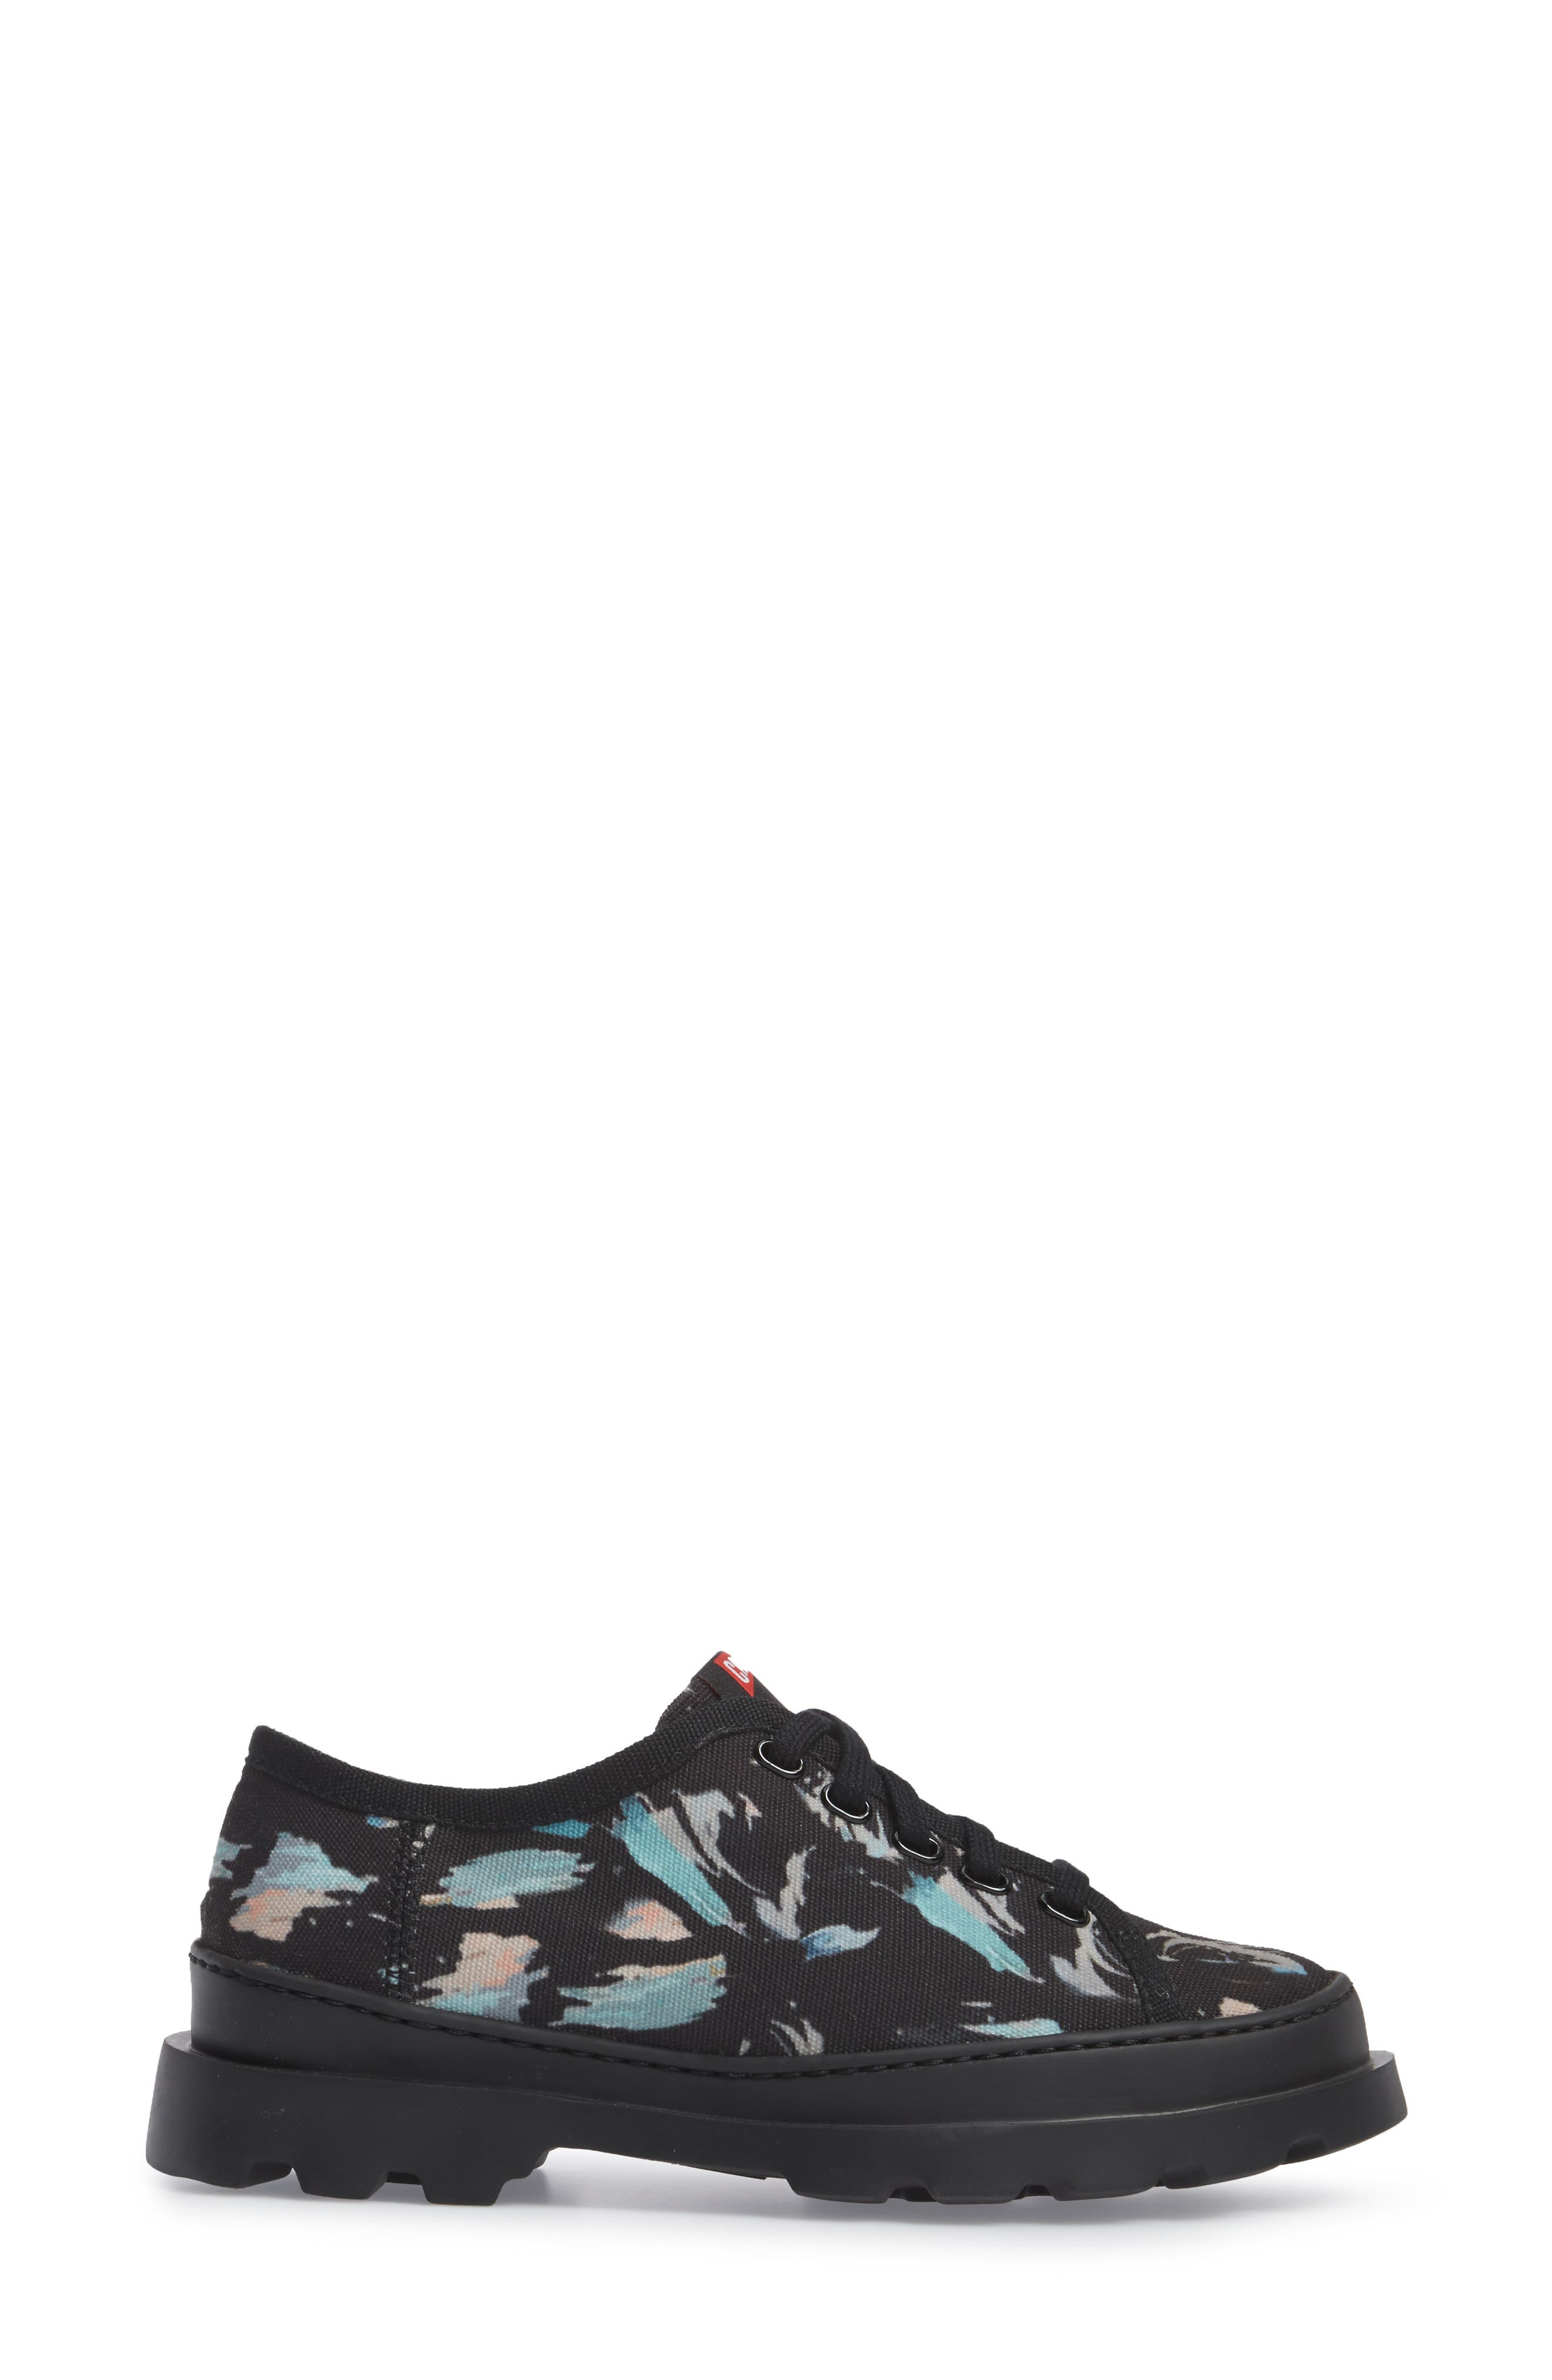 Brutus Lugged Platform Sneaker,                             Alternate thumbnail 3, color,                             Black Multi